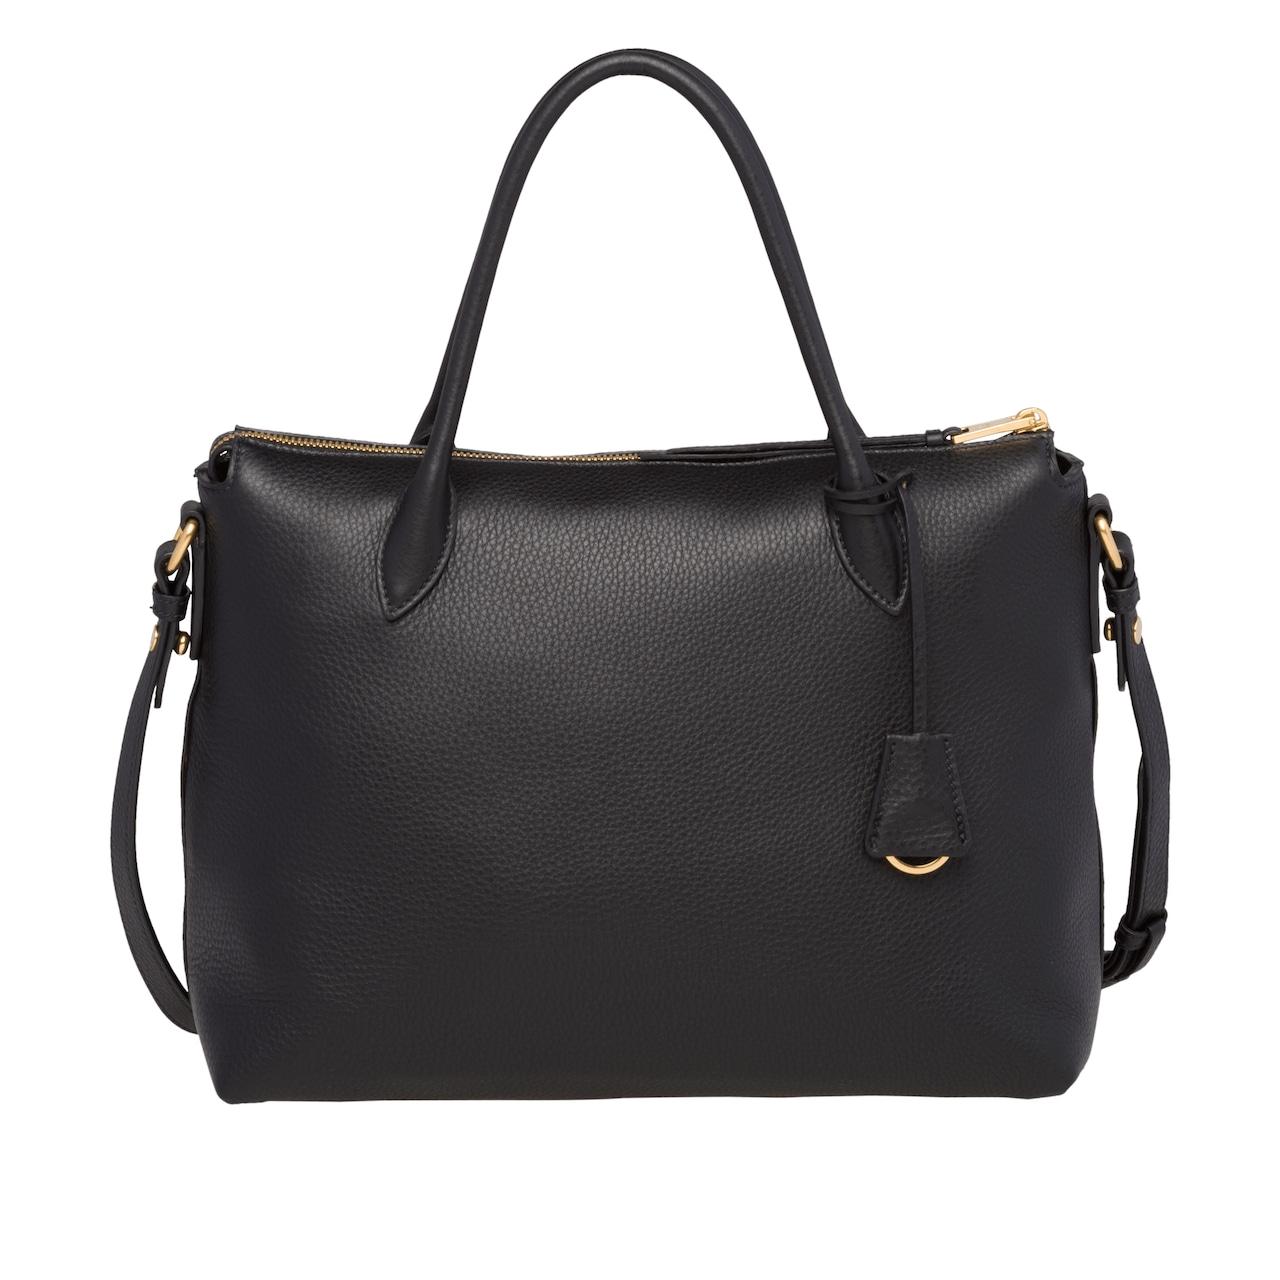 Calf leather bag